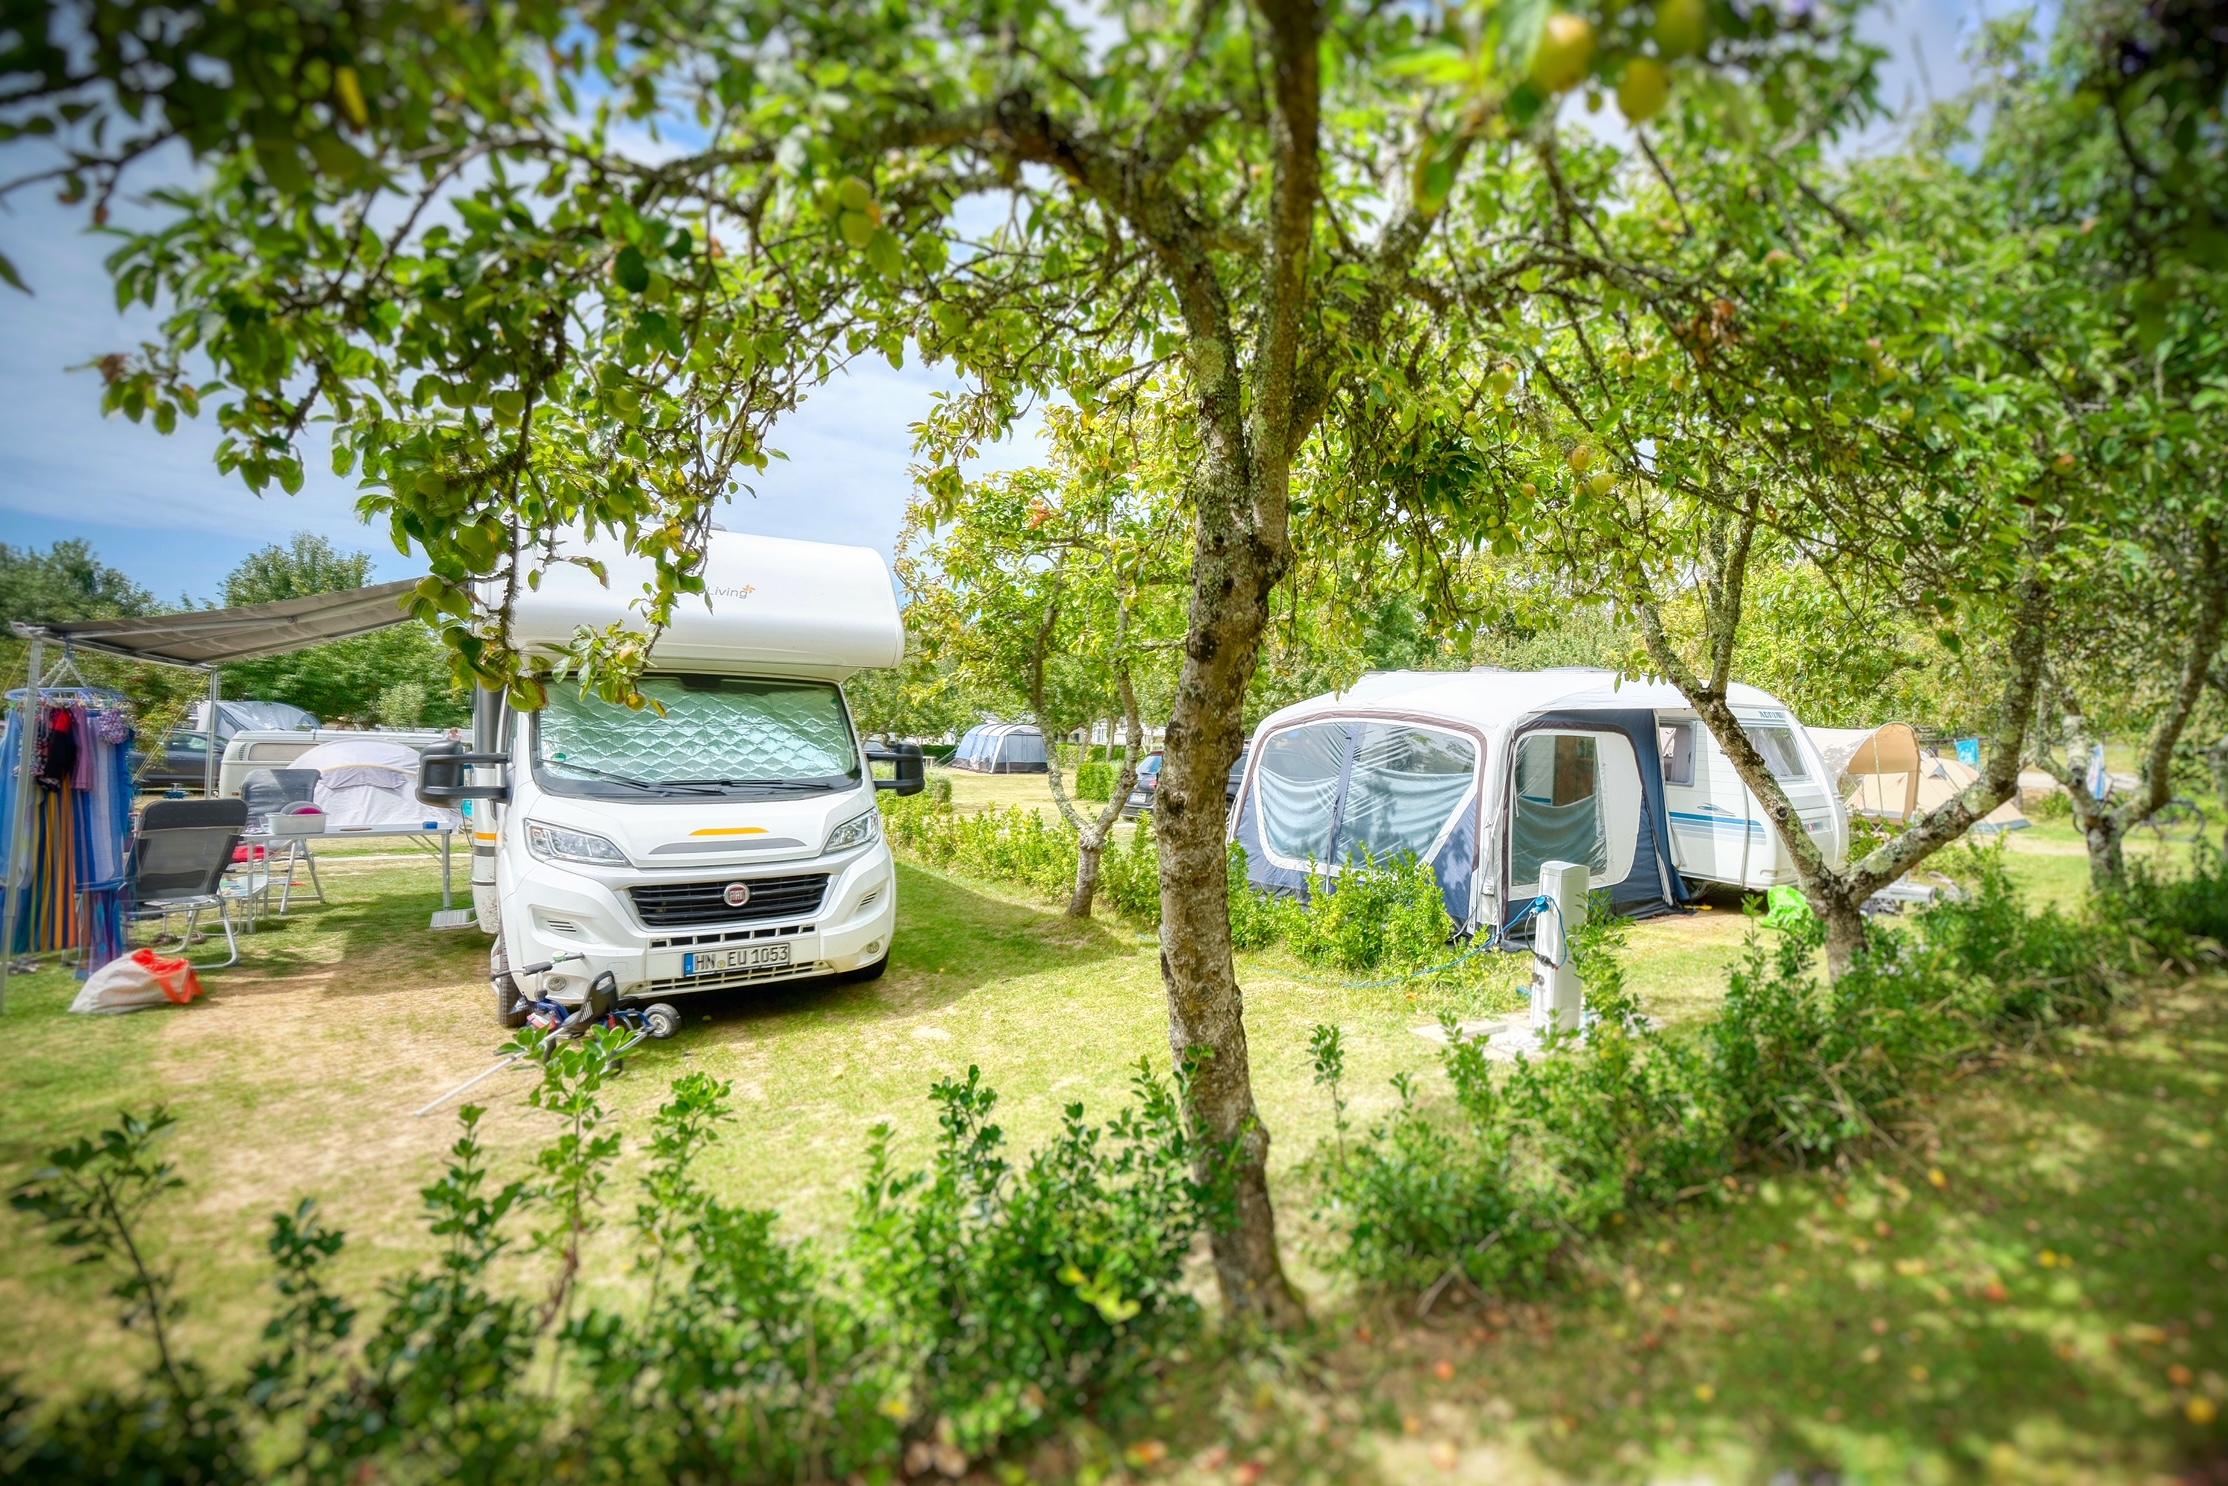 Emplacement - Emplacement Grand Confort - Camping Les Embruns